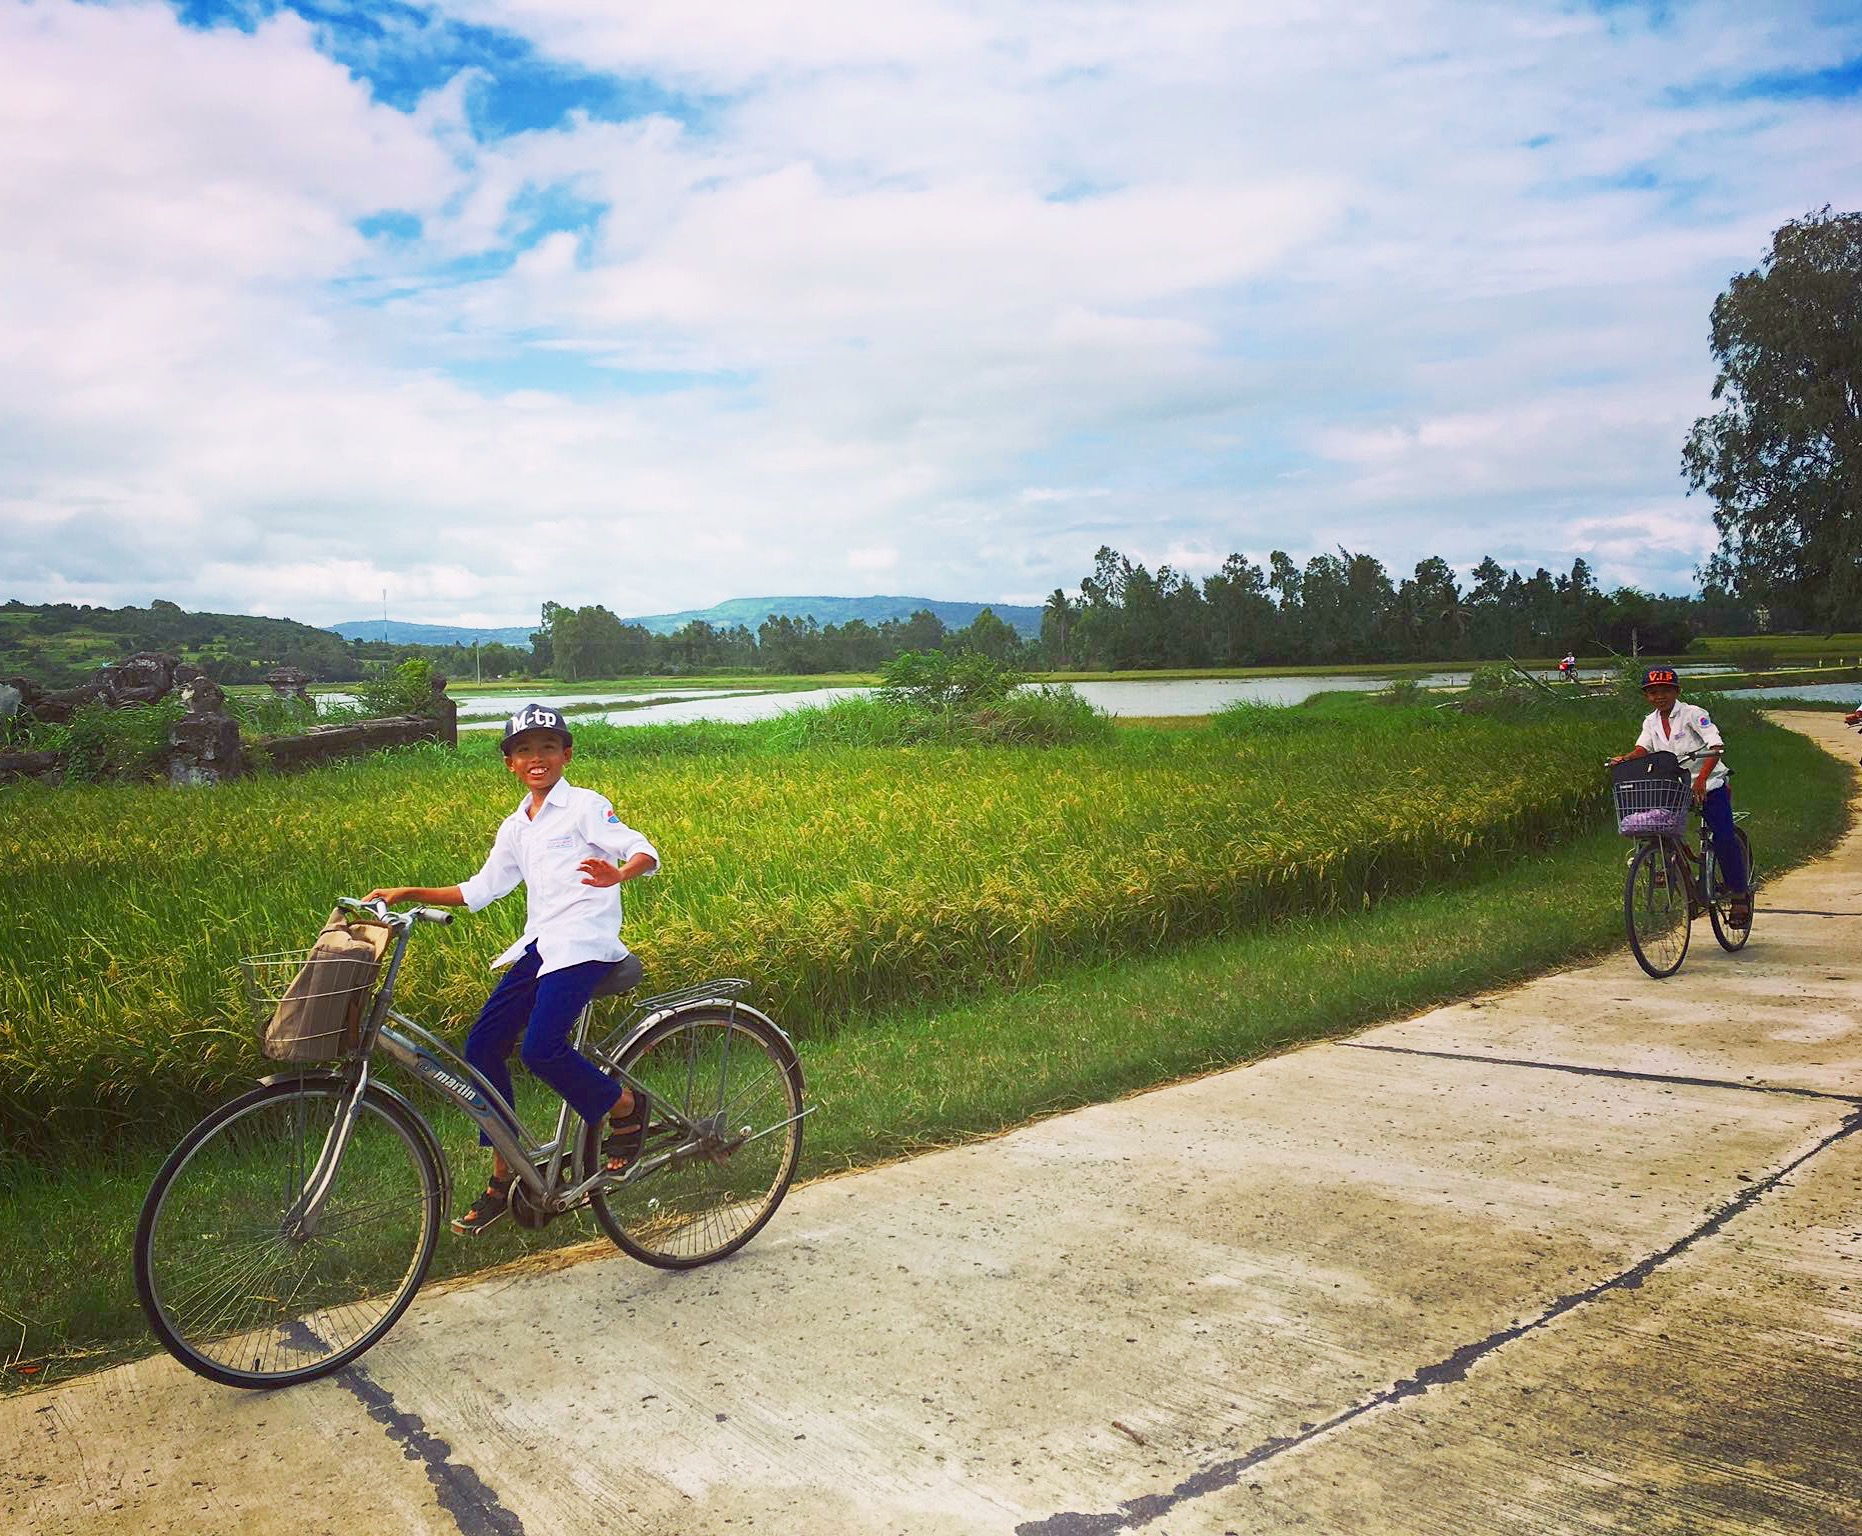 Beautiful pictures of Phu Yen tourism